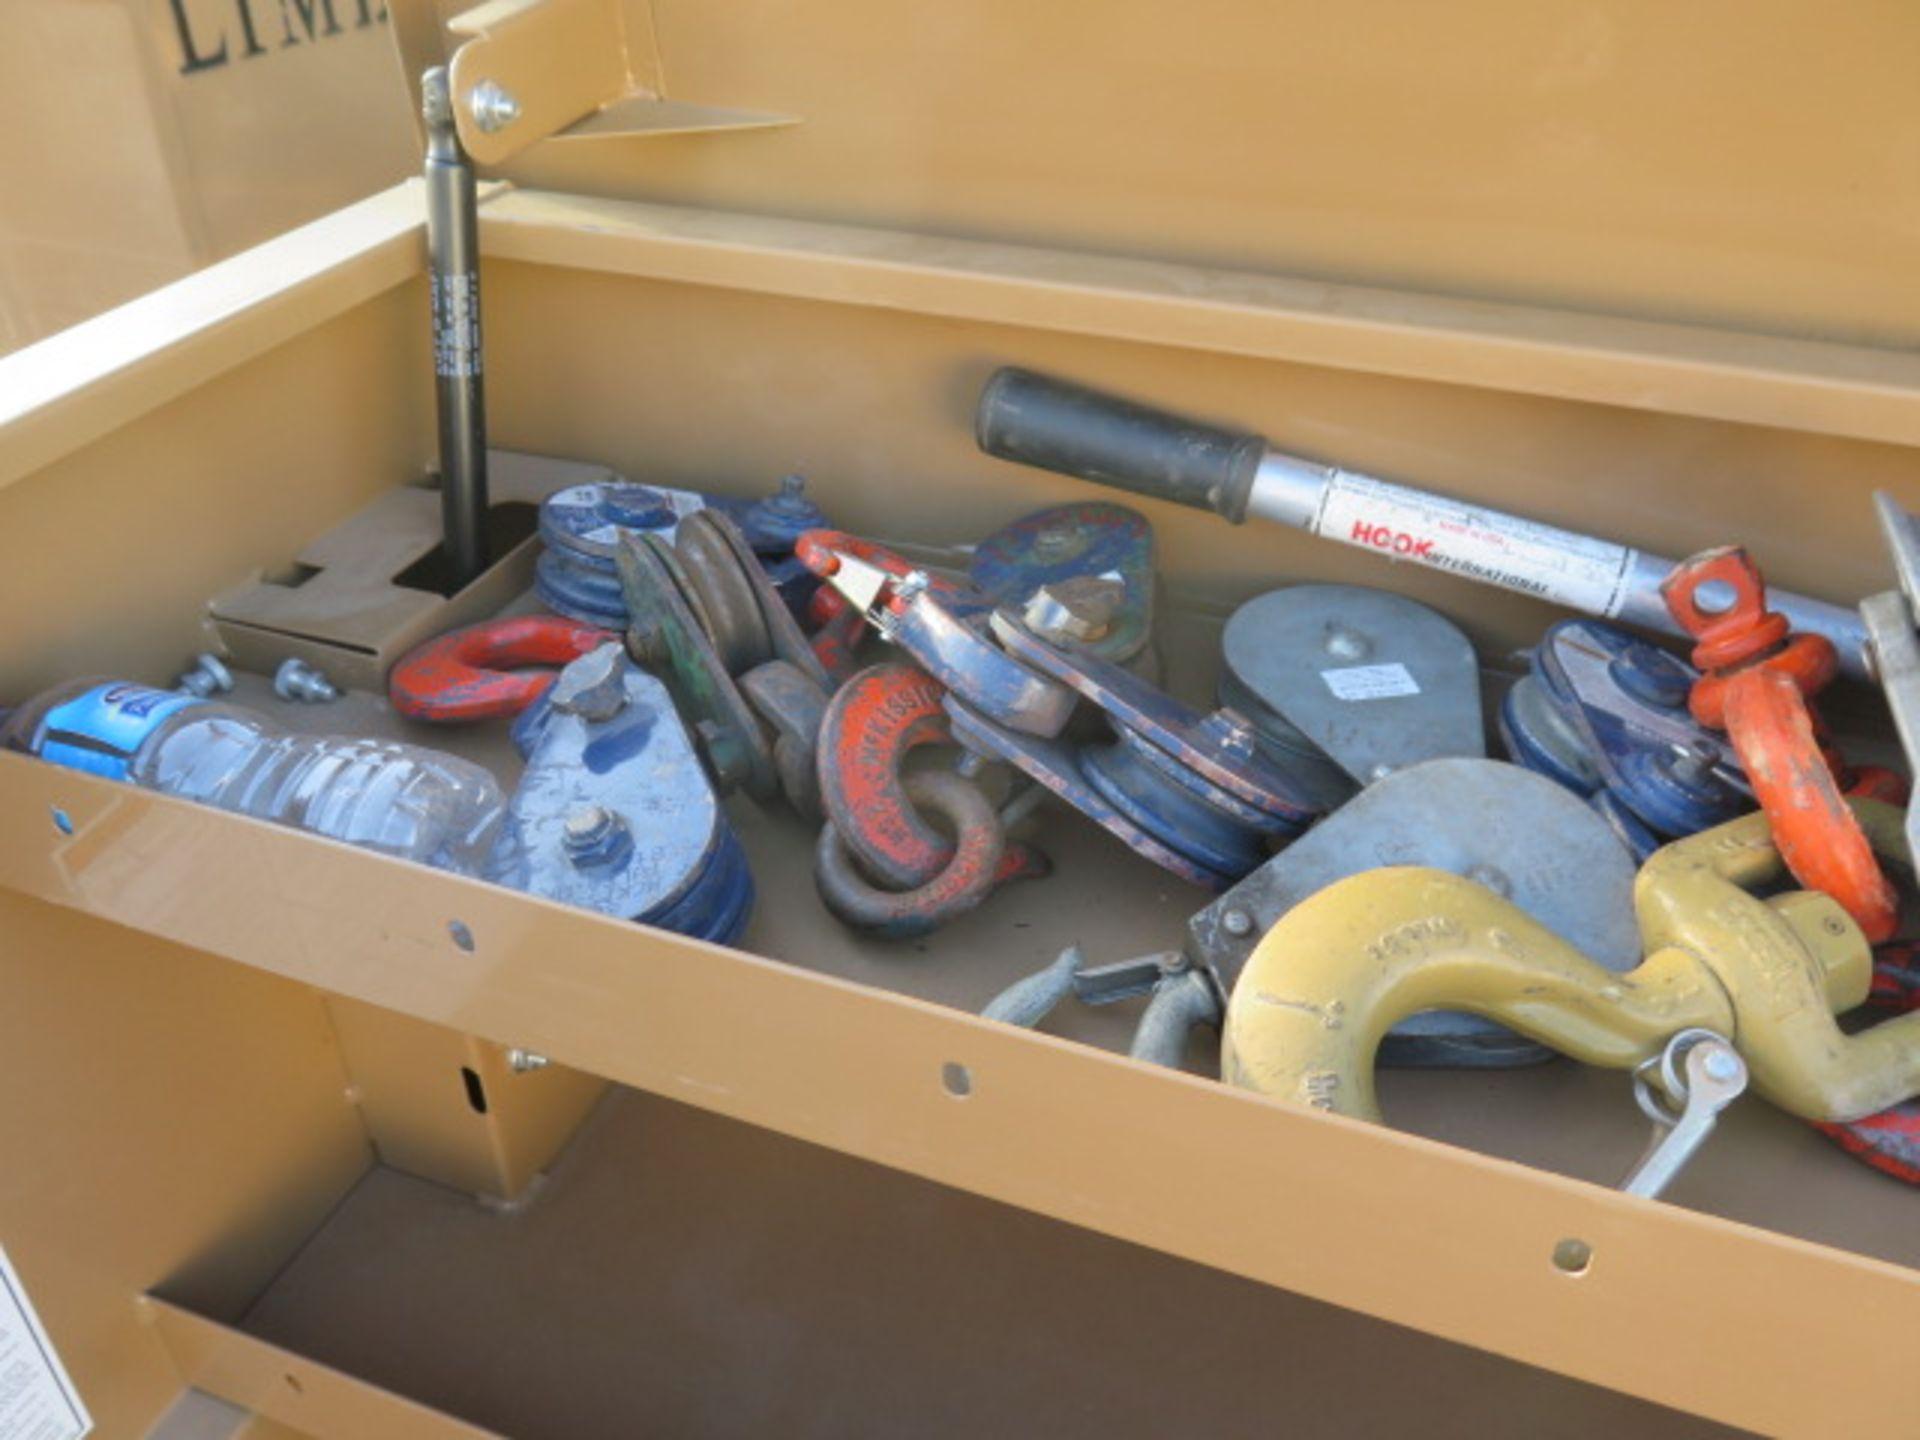 Knaack mdl. 89 Storagemaster Rolling Job Box w/ Come-Alongs (SOLD AS-IS - NO WARRANTY) - Image 5 of 12